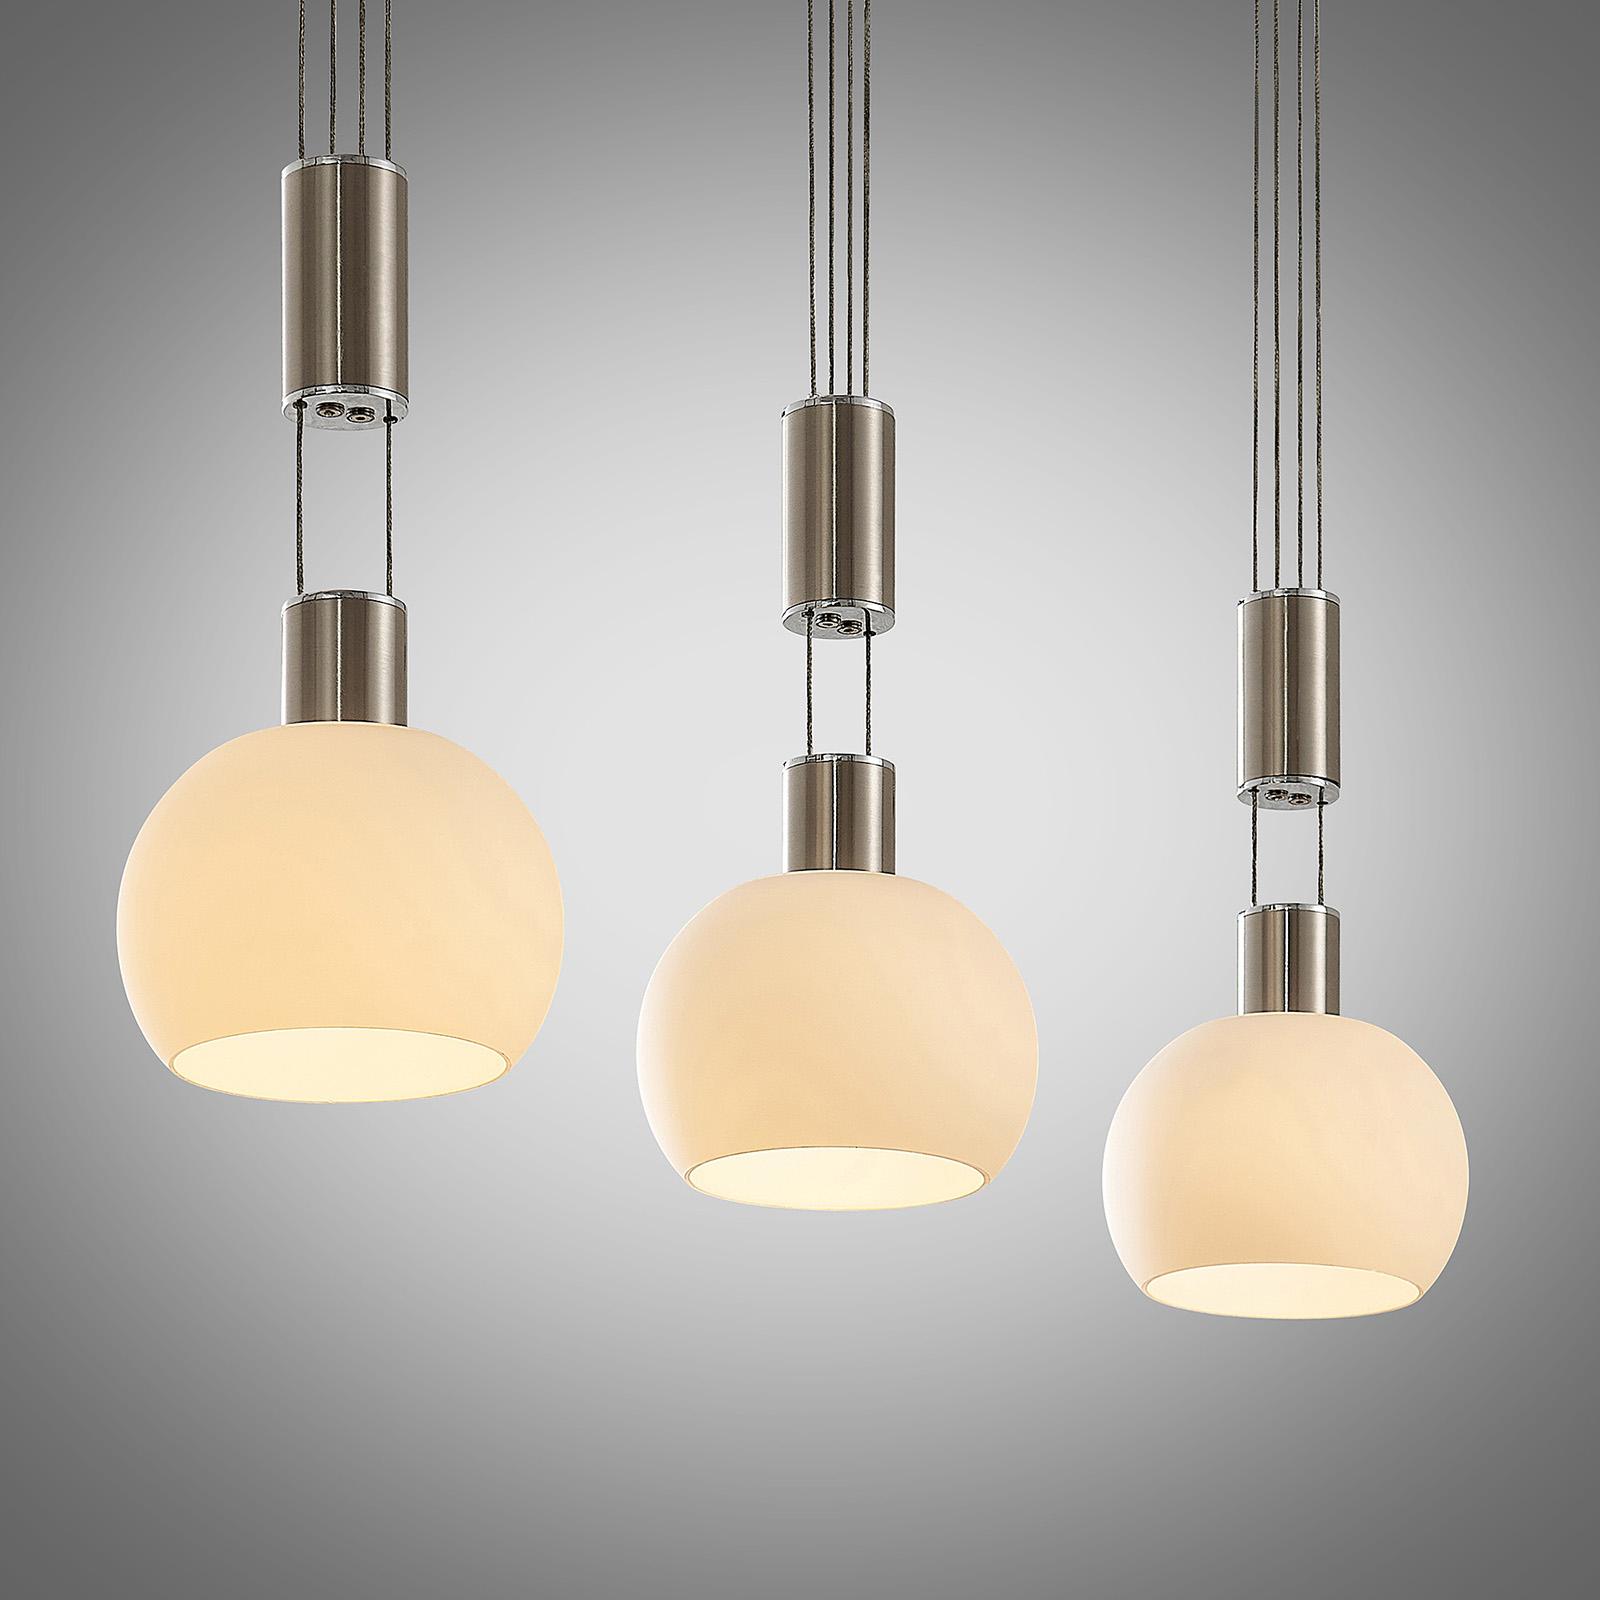 Lindby Aurell lámpara colgante LED, 3 luces níquel